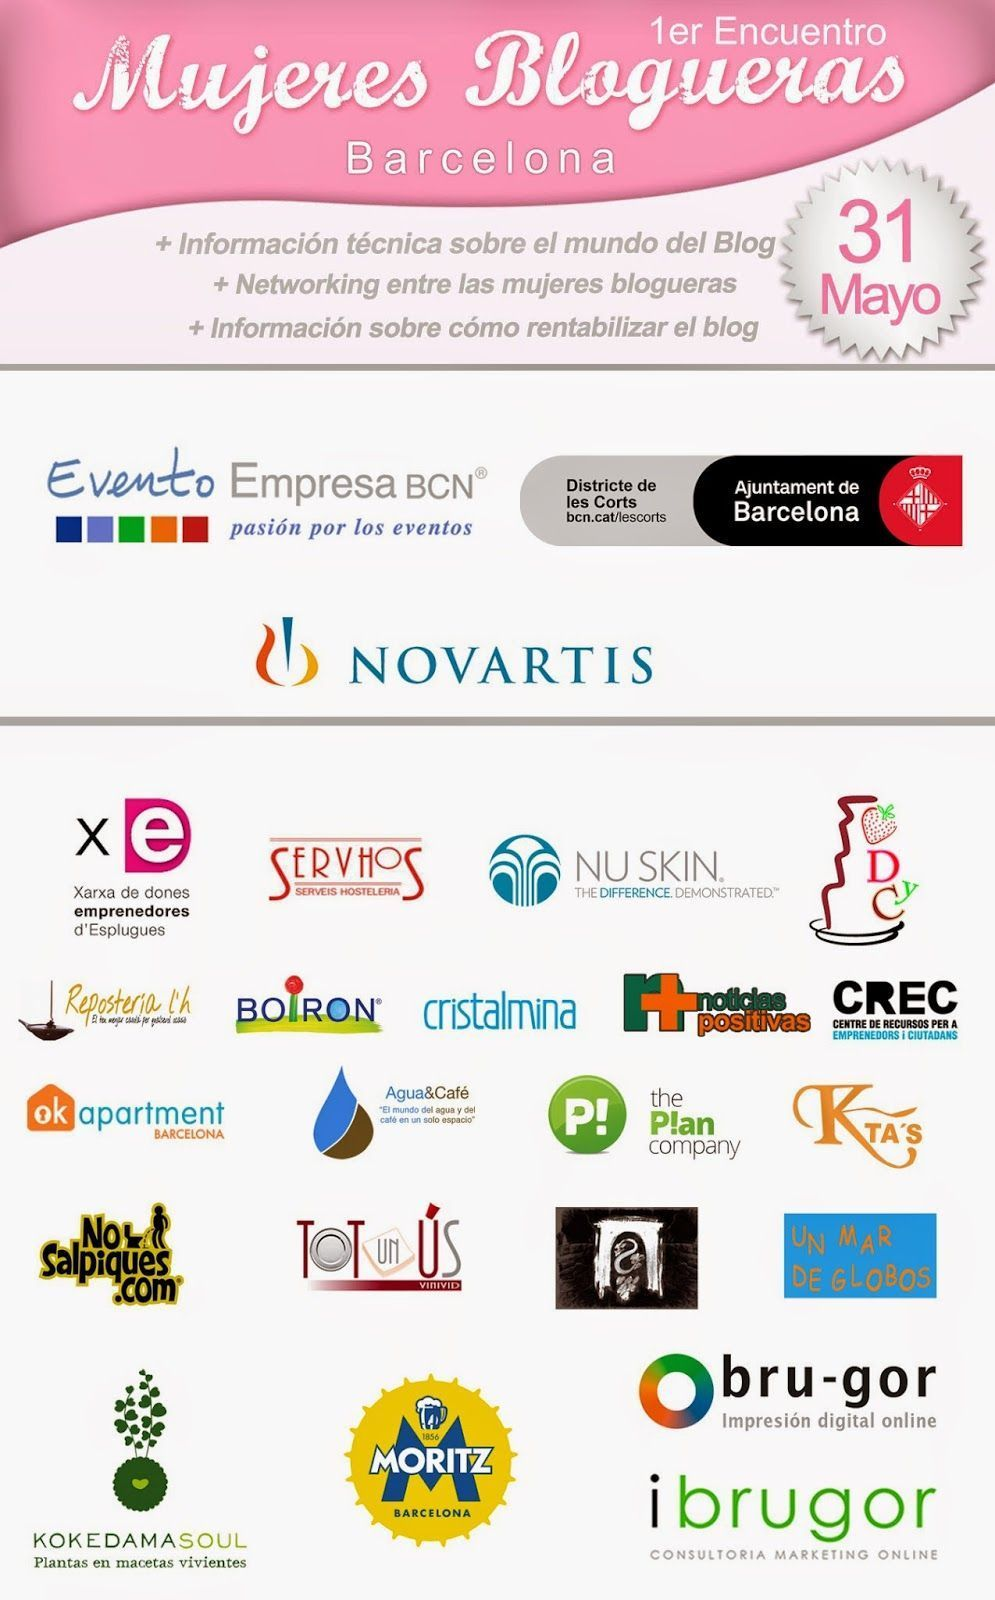 mujeres-blogueras-barcelona